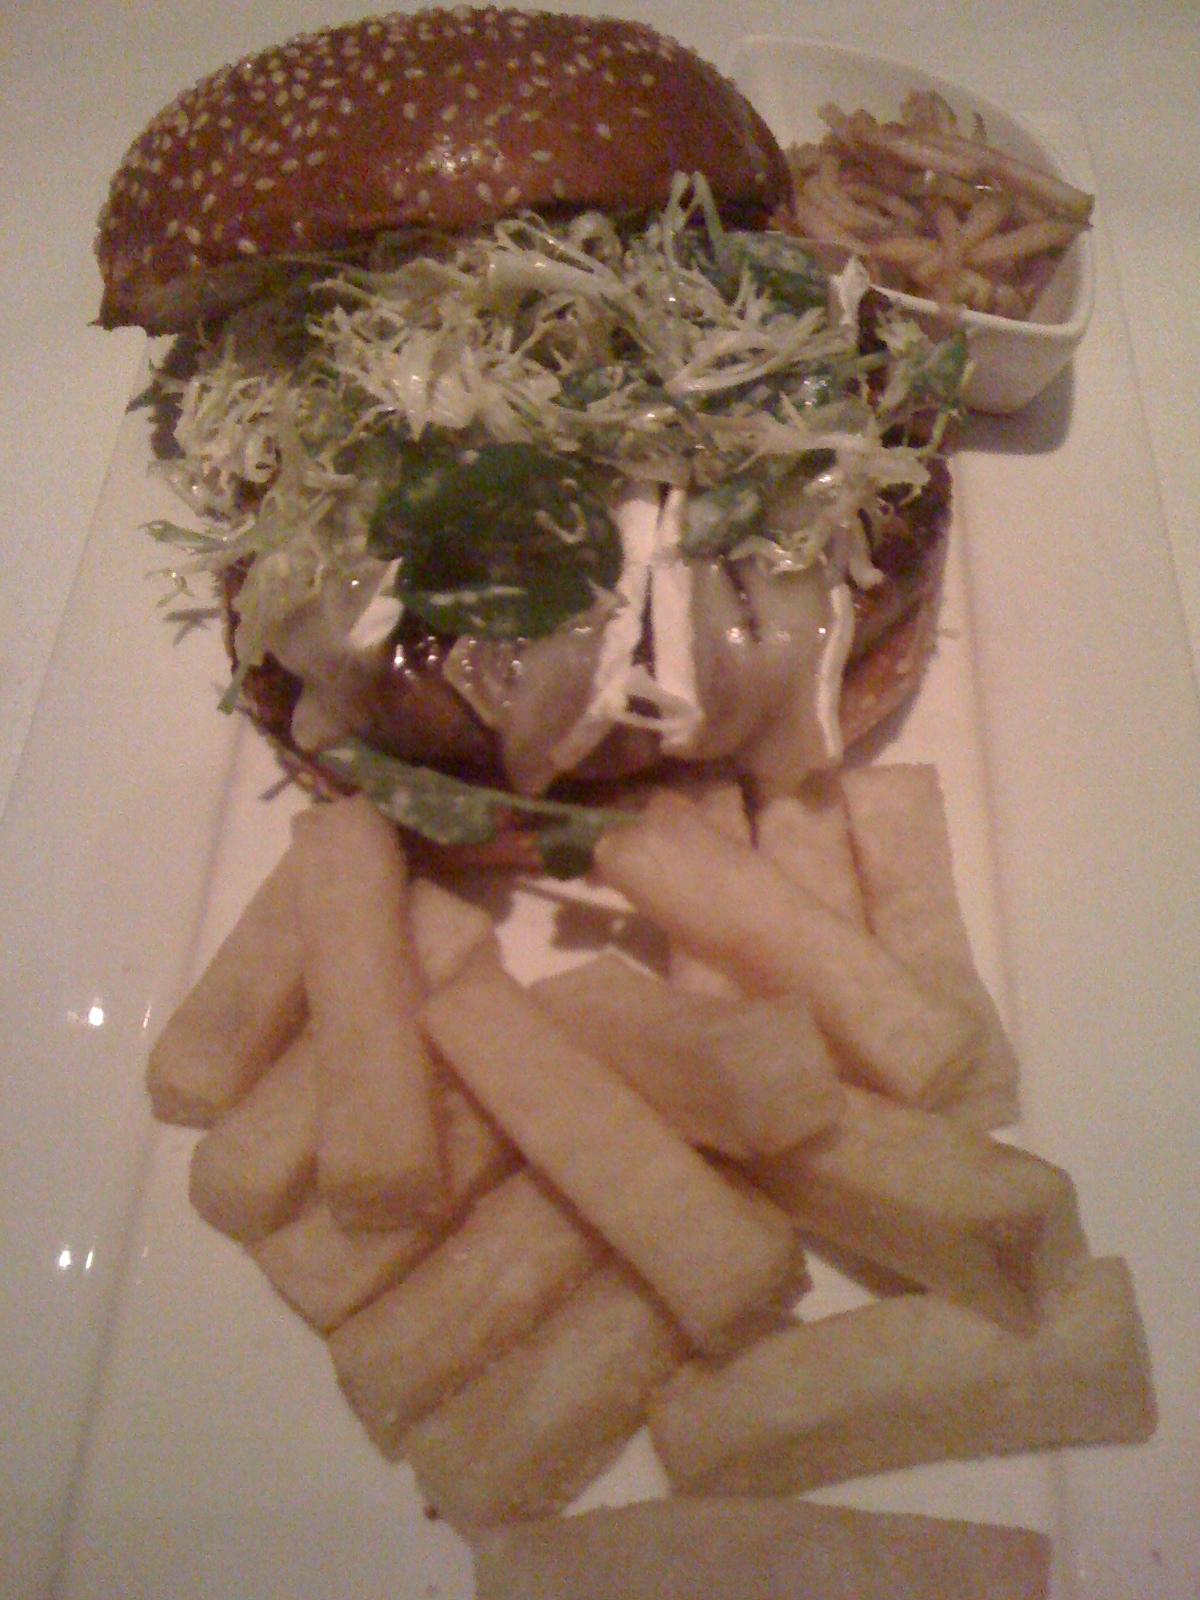 Click image for larger version  Name:Truffle Brie Hamburger Lark Creek Steak 013112.JPG Views:35 Size:699.6 KB ID:150691